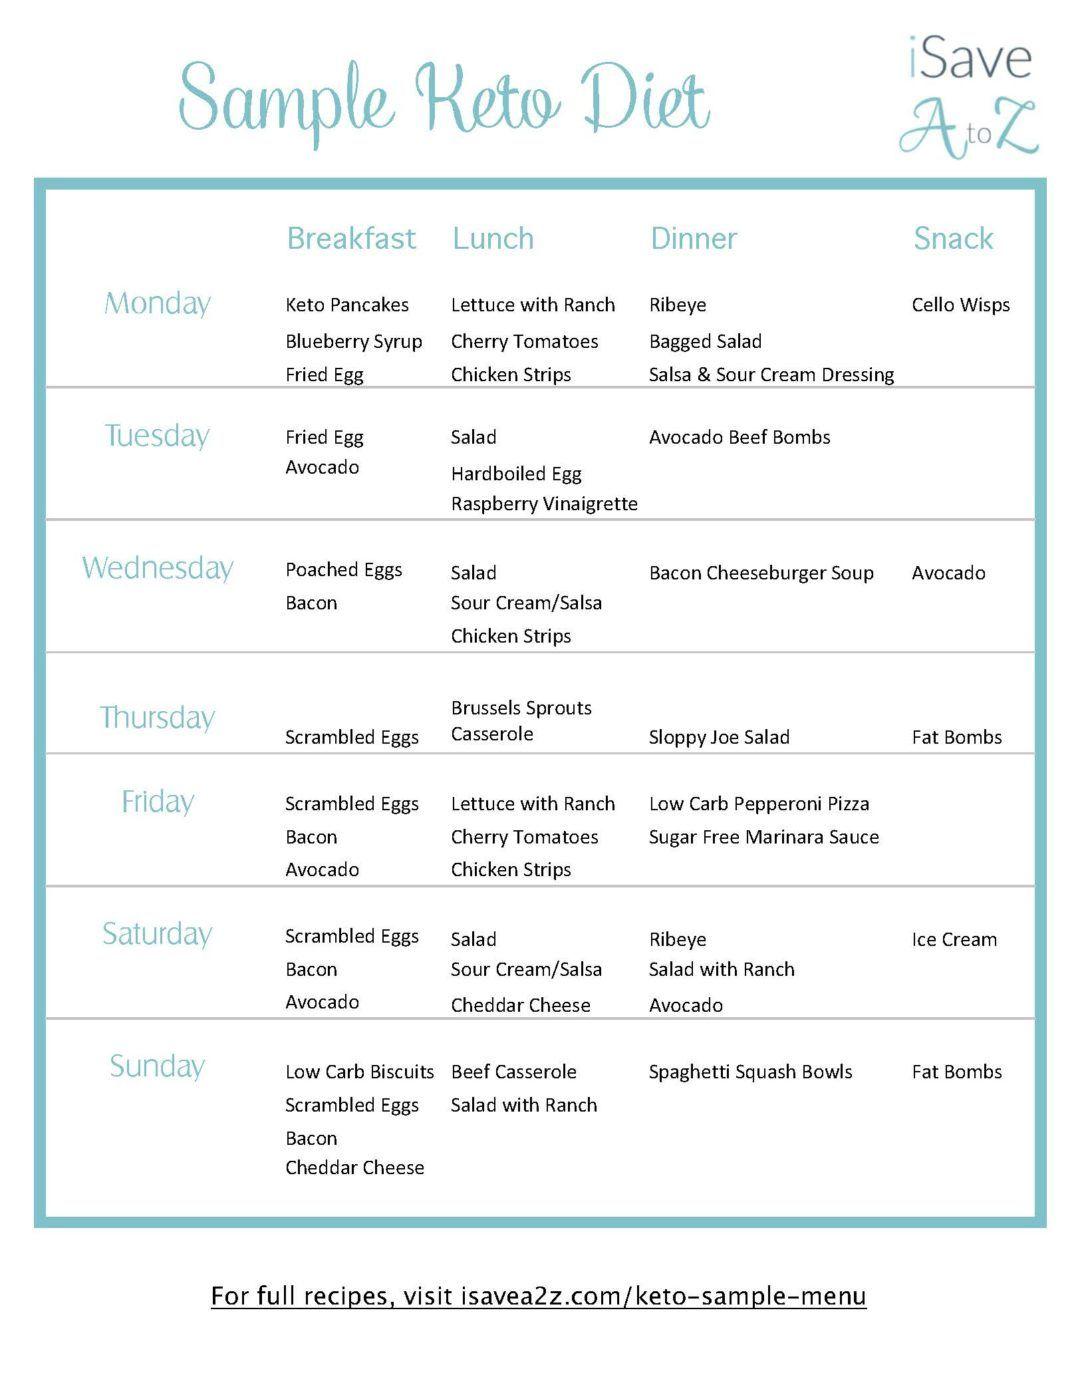 Grab This Printable 7 Day Keto Sample Menu Plan